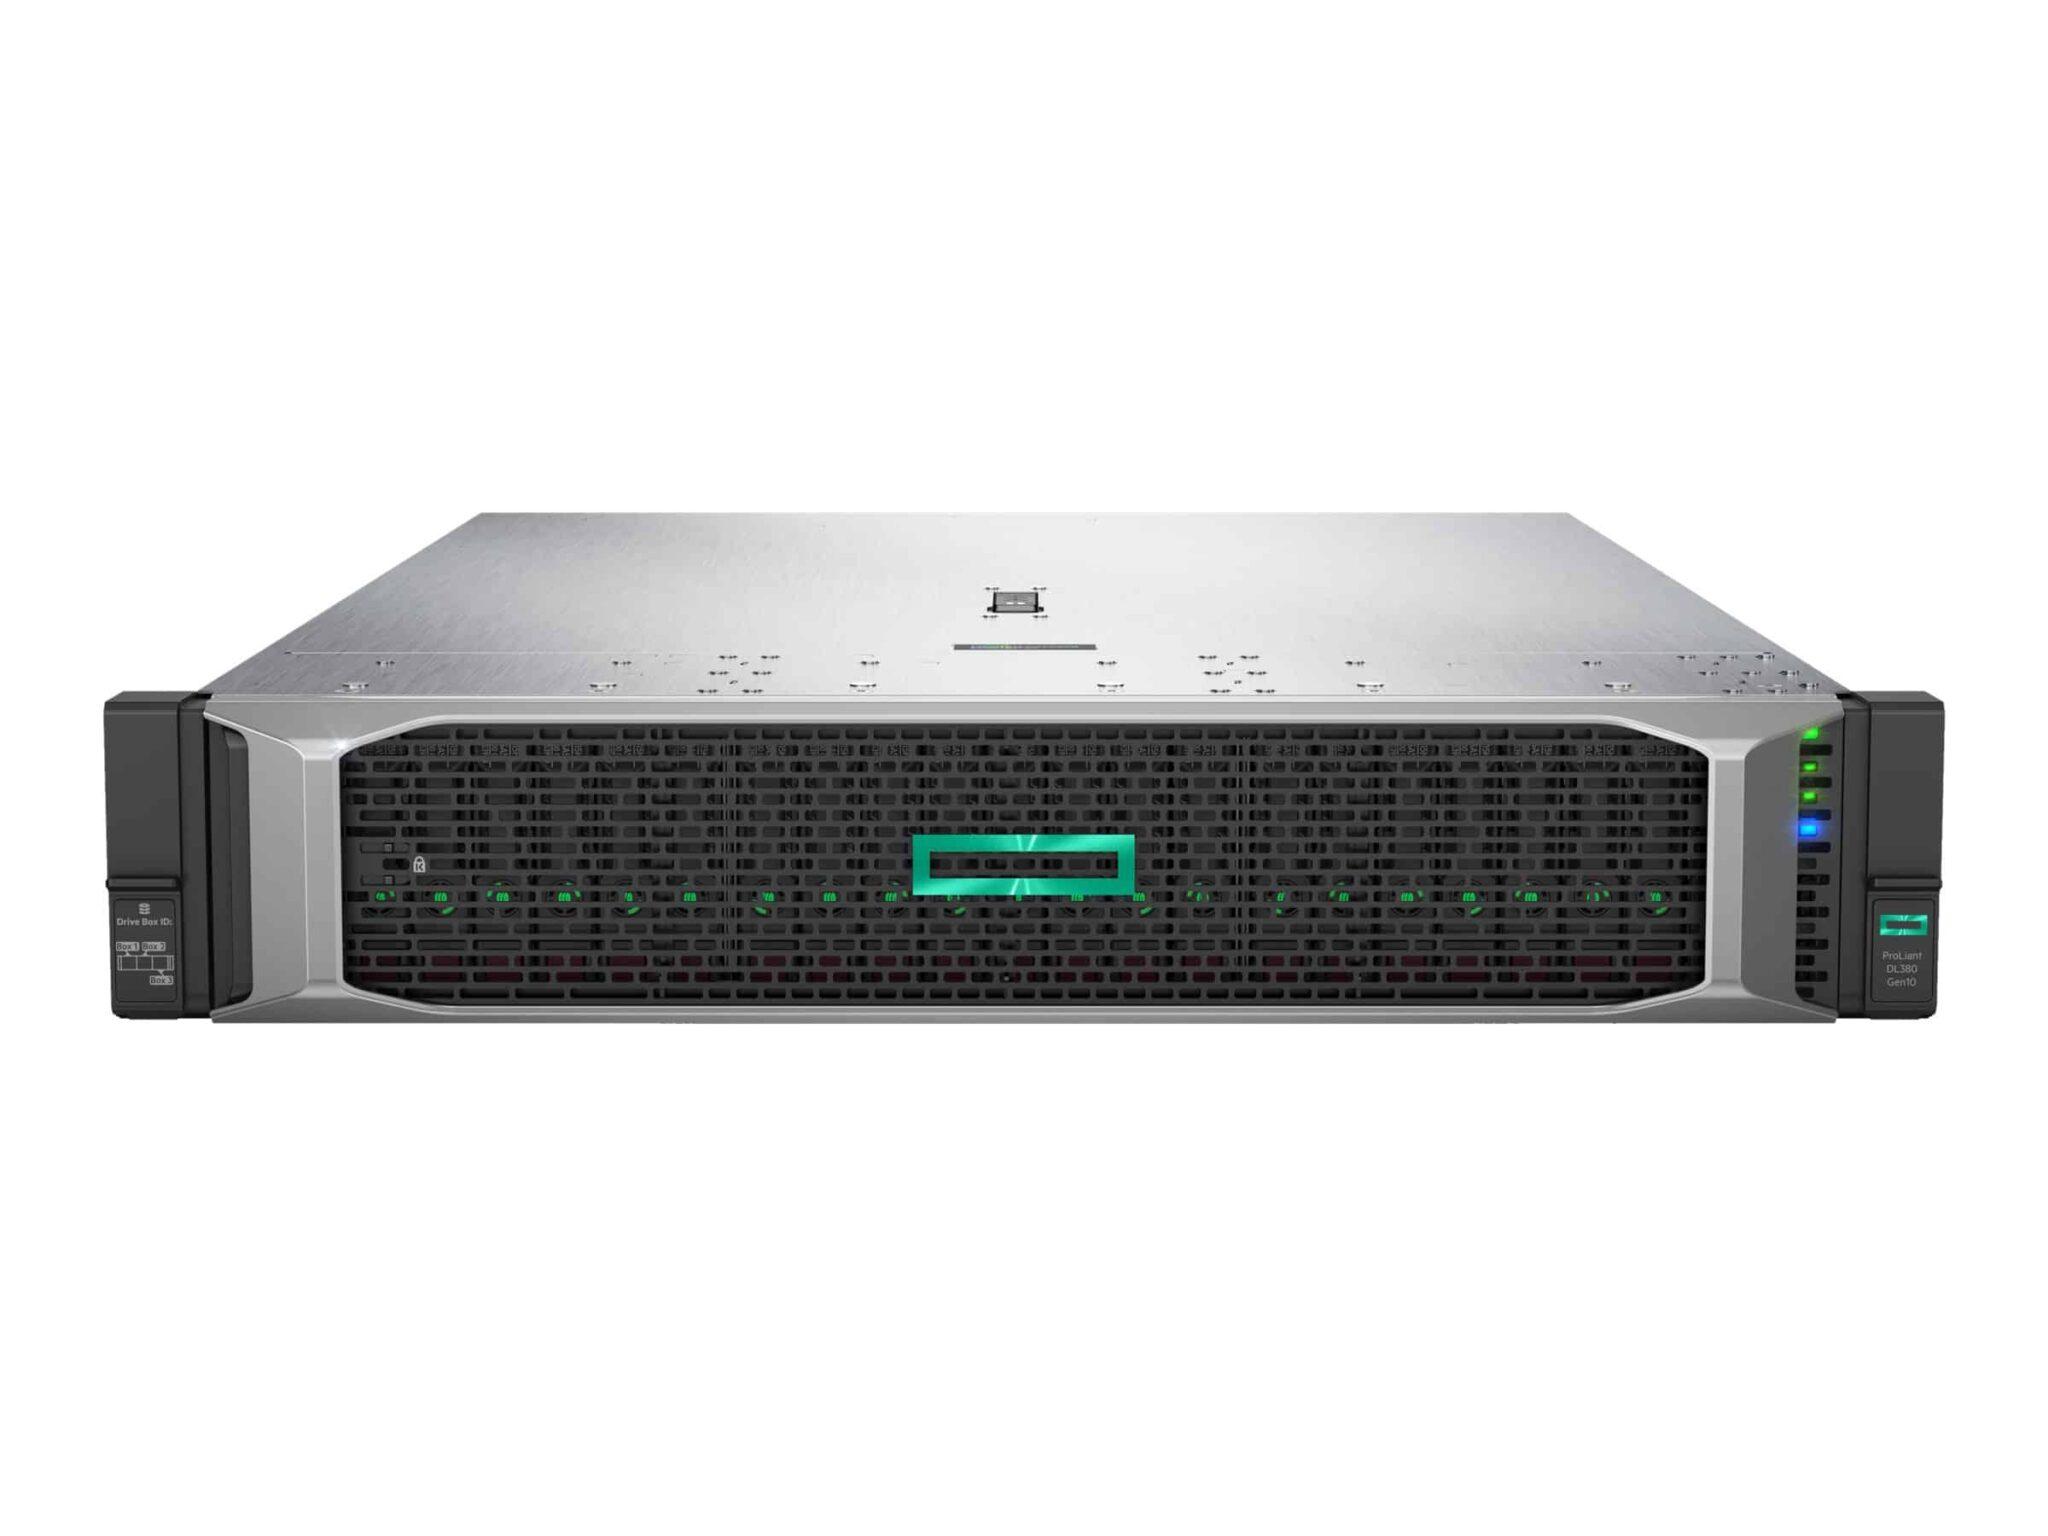 HPE-DL380-Gen10-5115-1P-16GB-8SFF-Server-Smart-Buy